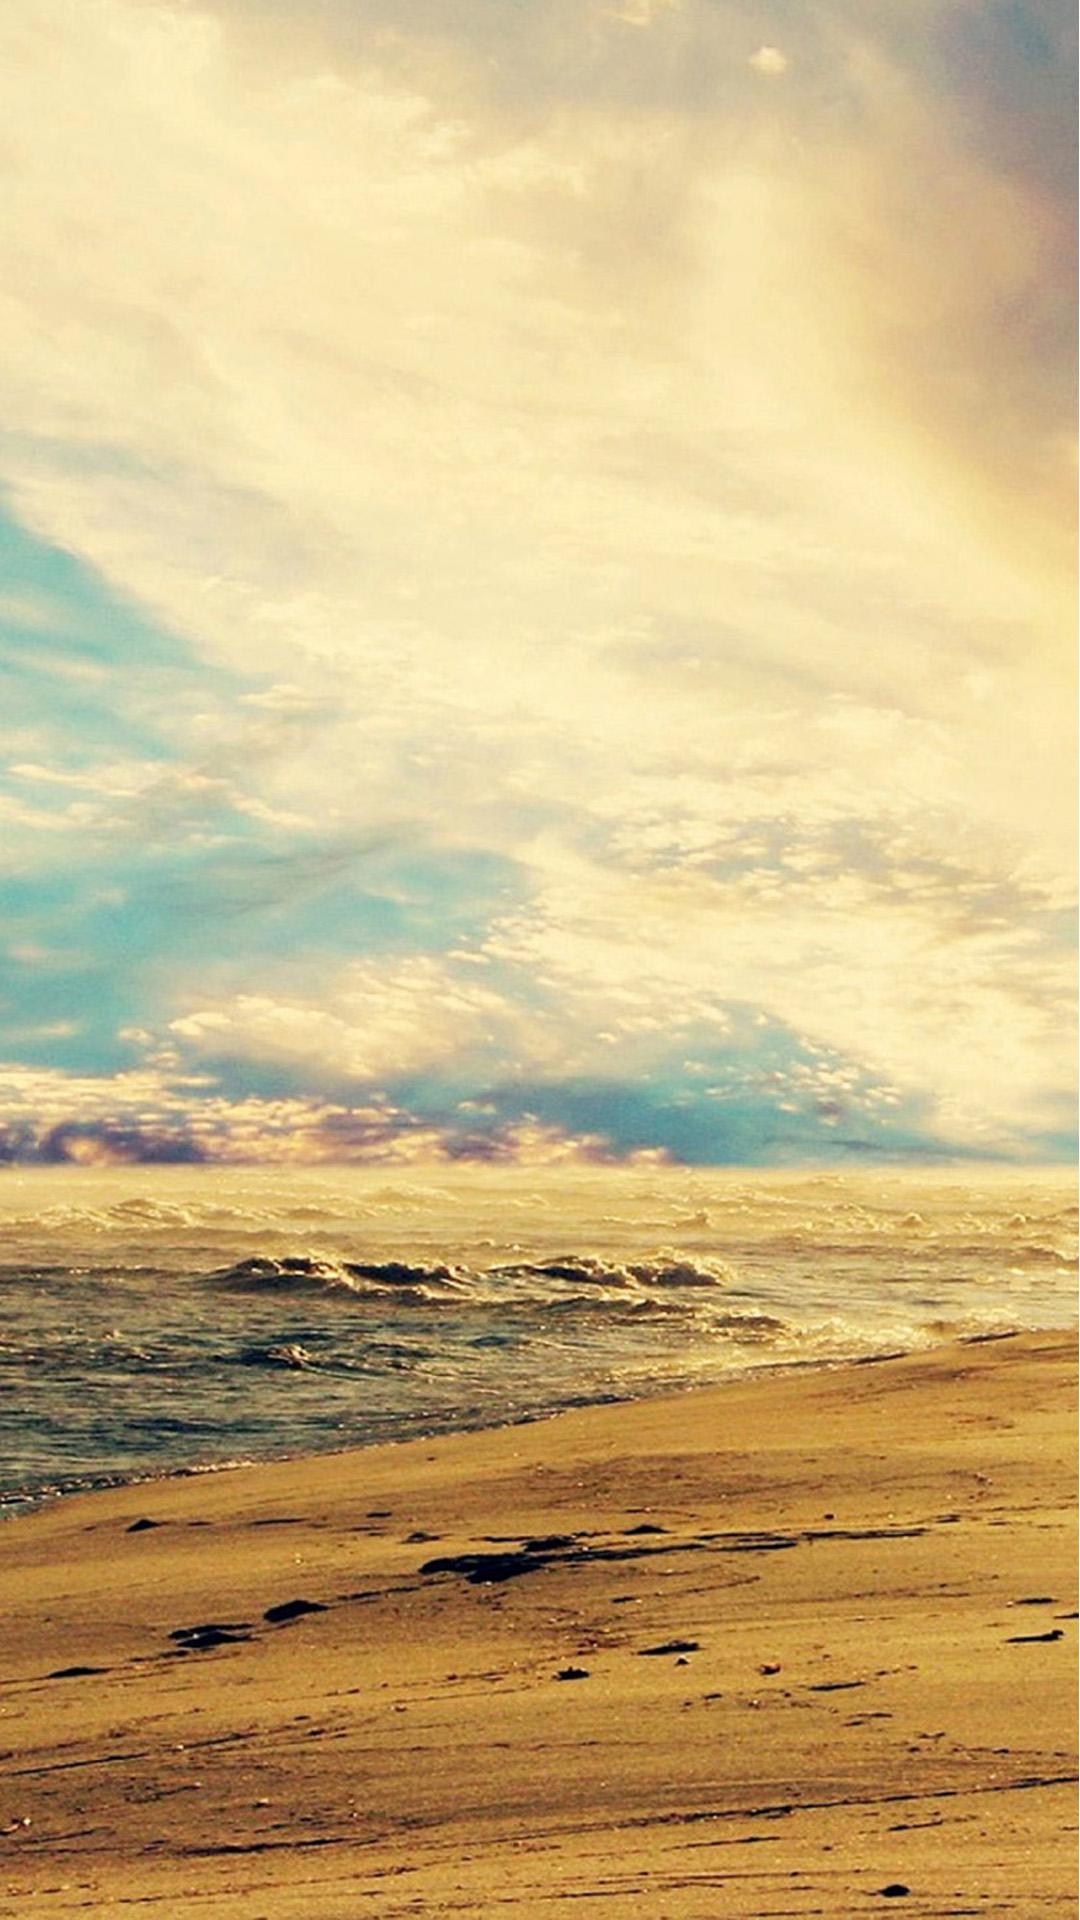 Free Download Beach Iphone 6 Plus Wallpaper 136 Iphone 6